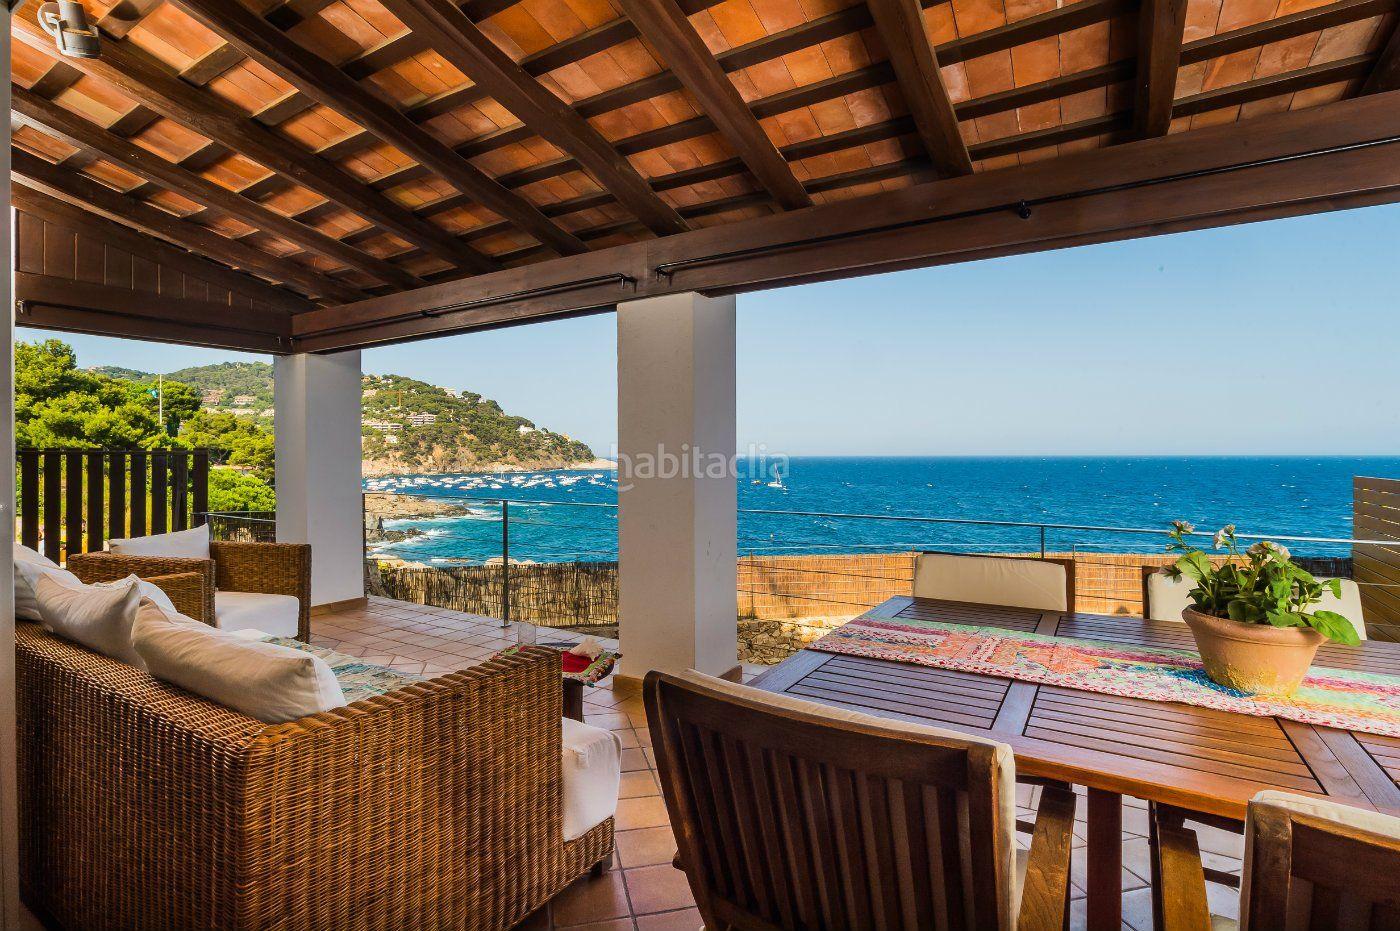 House by 2.700.000€ in in Calella de Palafrugell